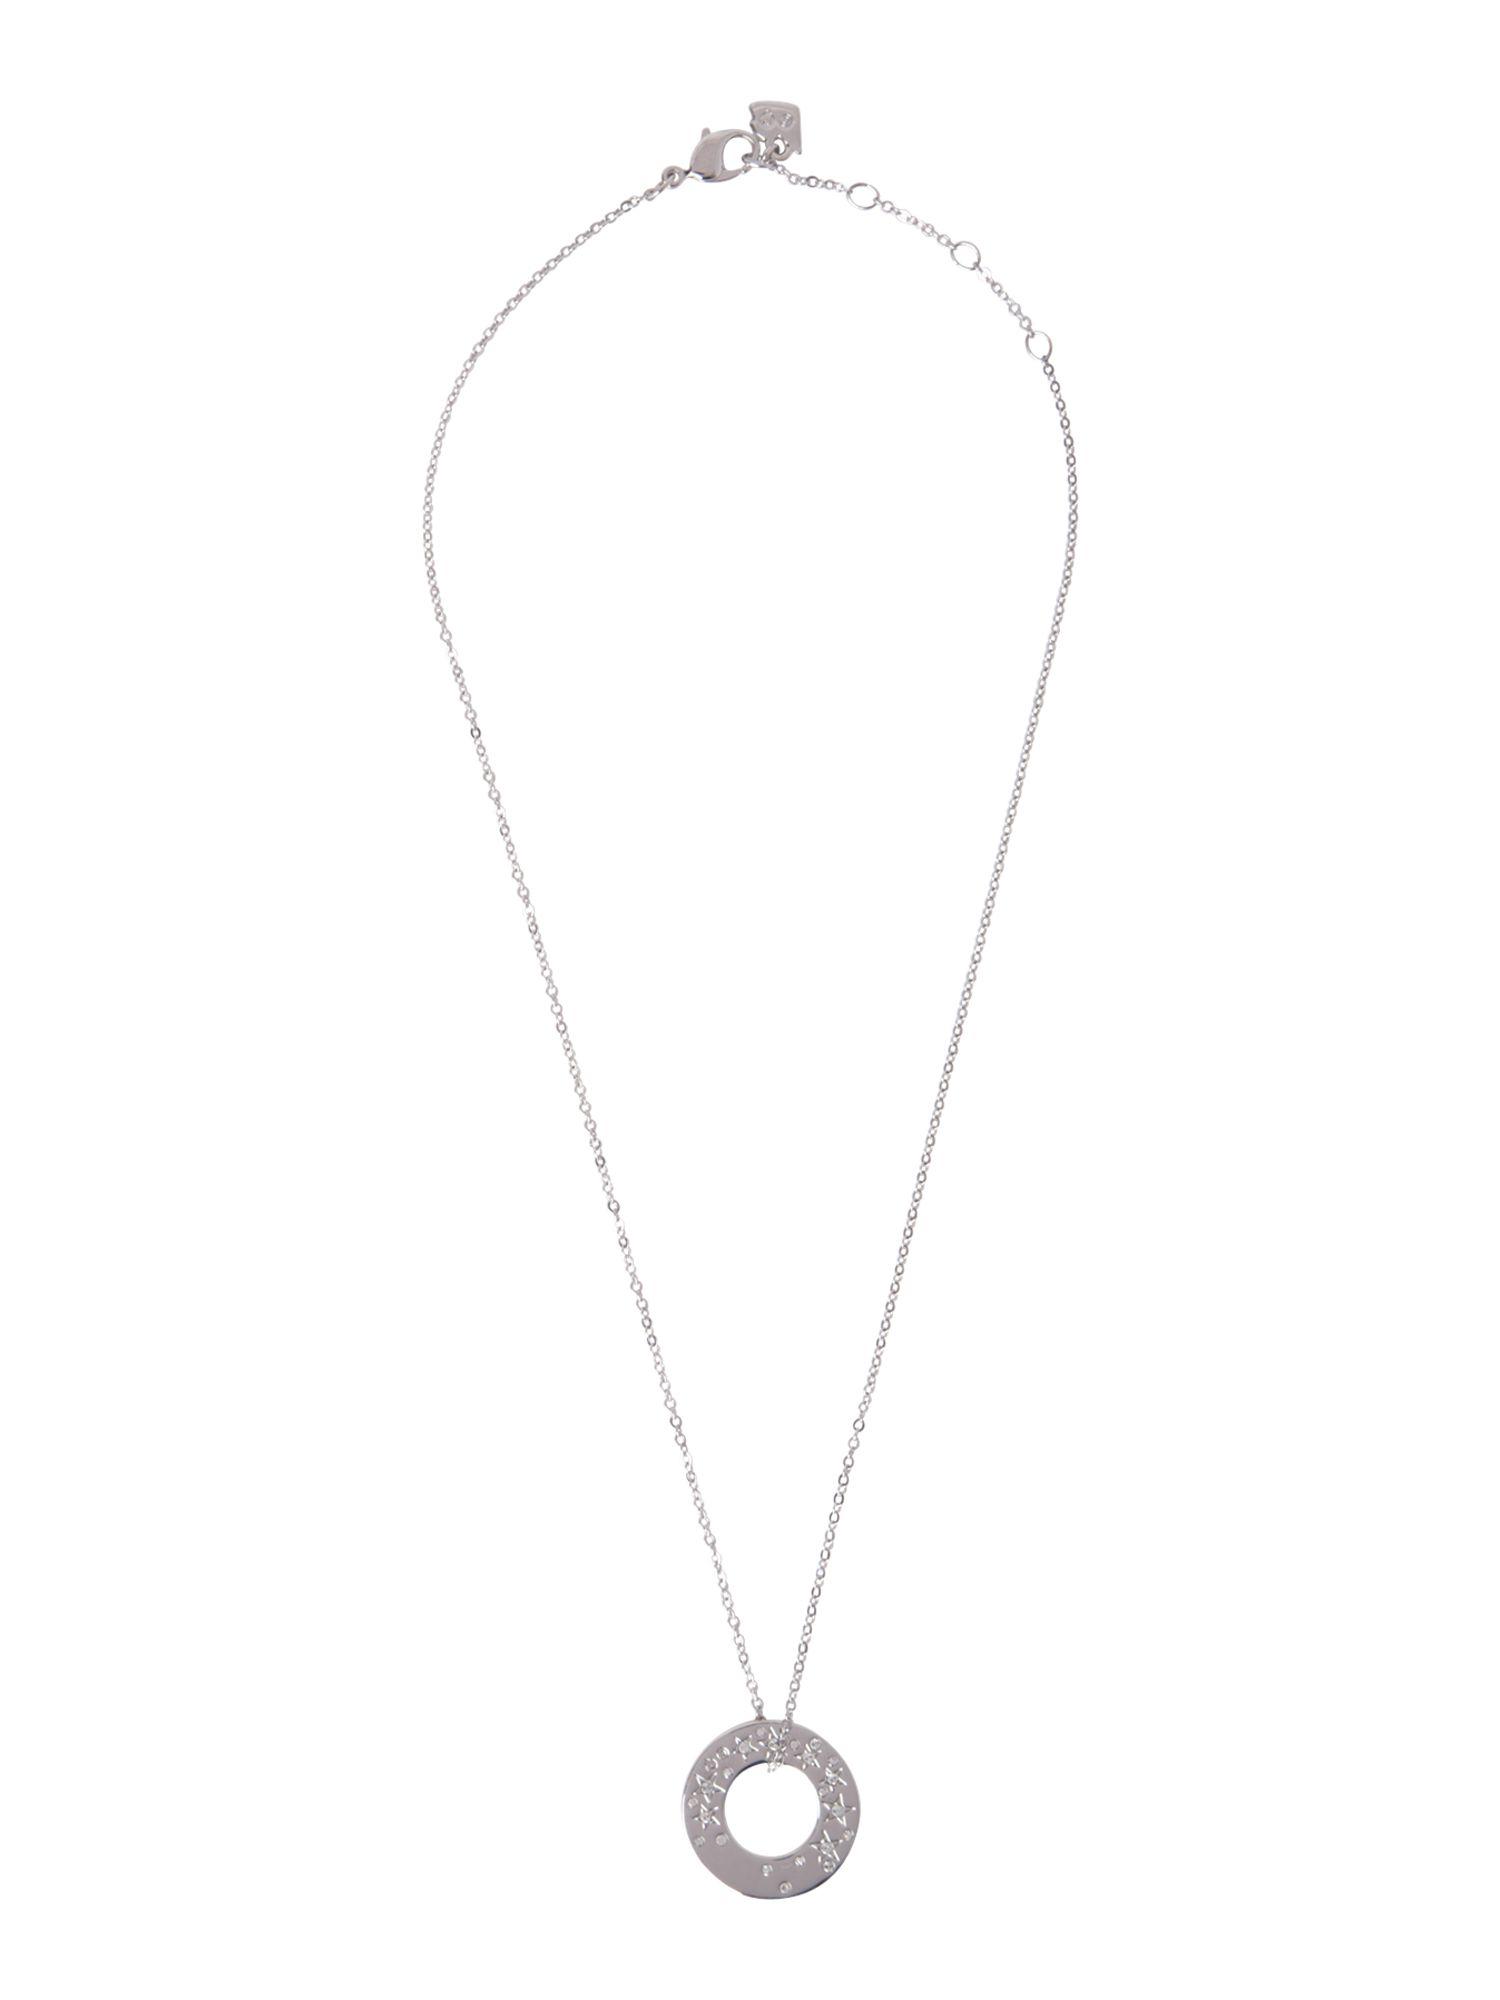 Swarovski Metropolis Crystal Star Oval Pendant in Silver (Metallic)